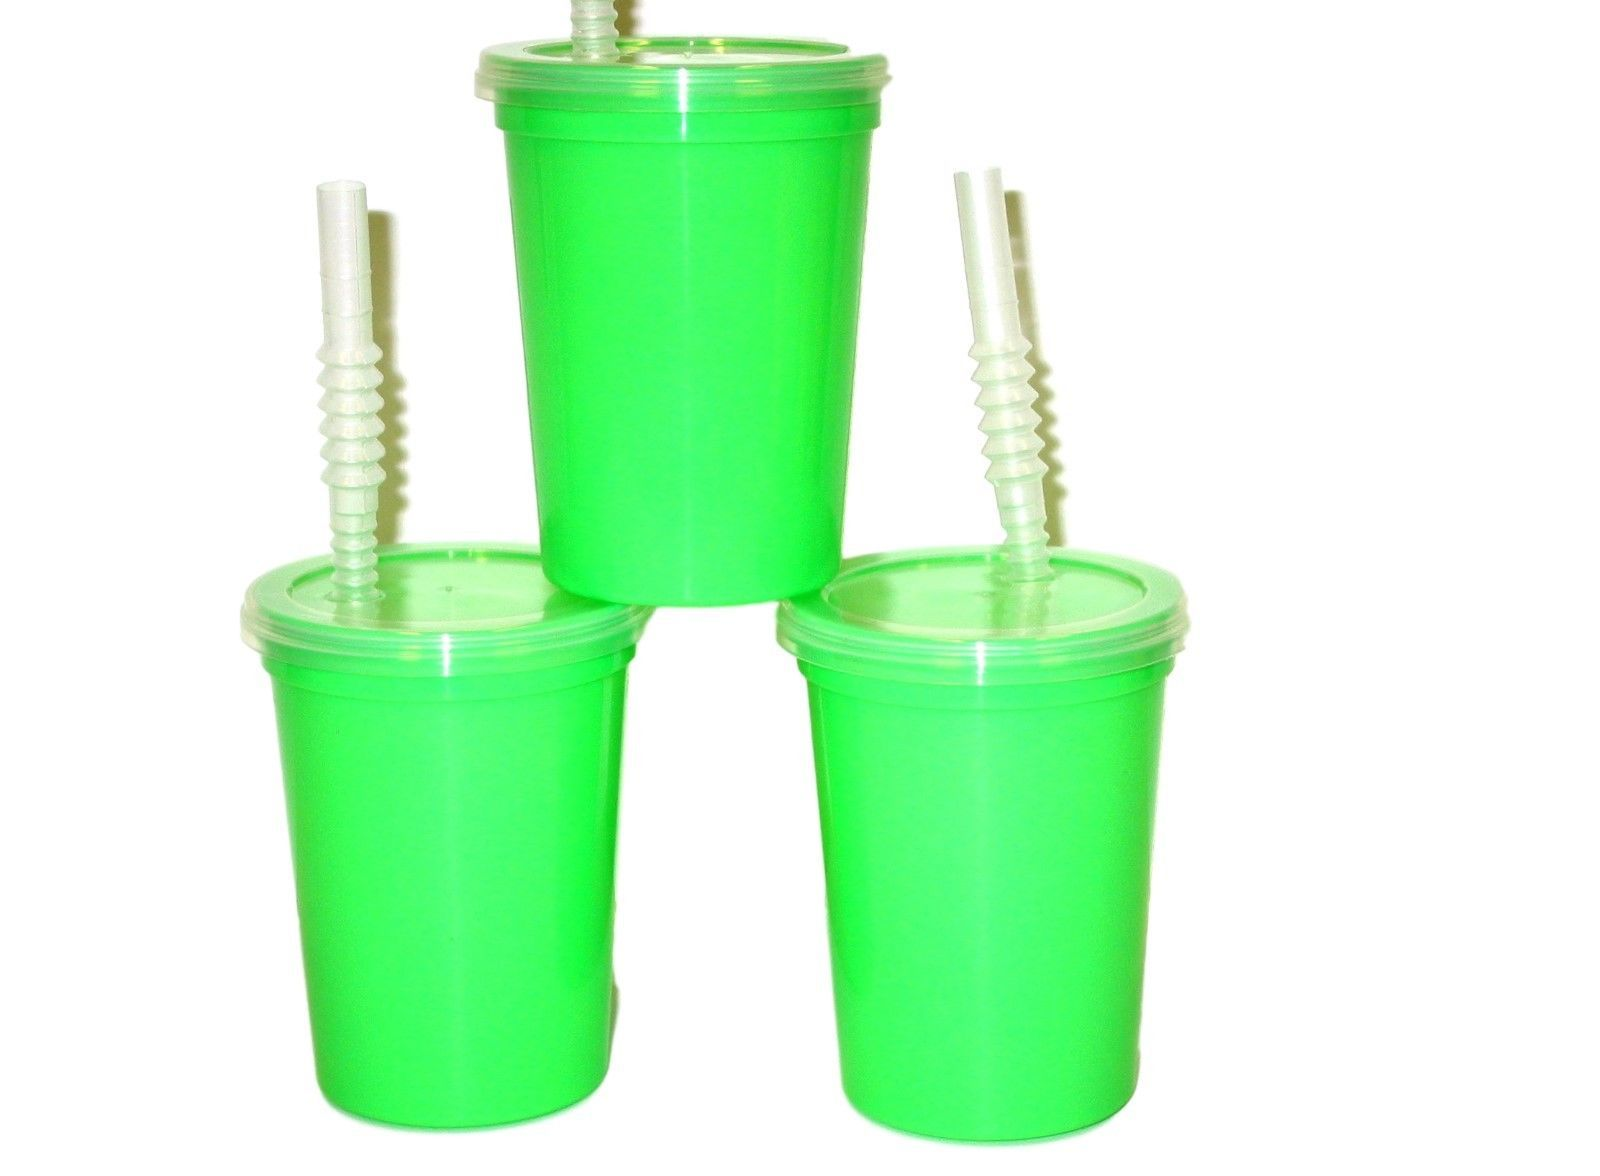 12-12 Oz White Plastic Drinking Glasses Cups Mfg.USA Lead Free Free Shipping